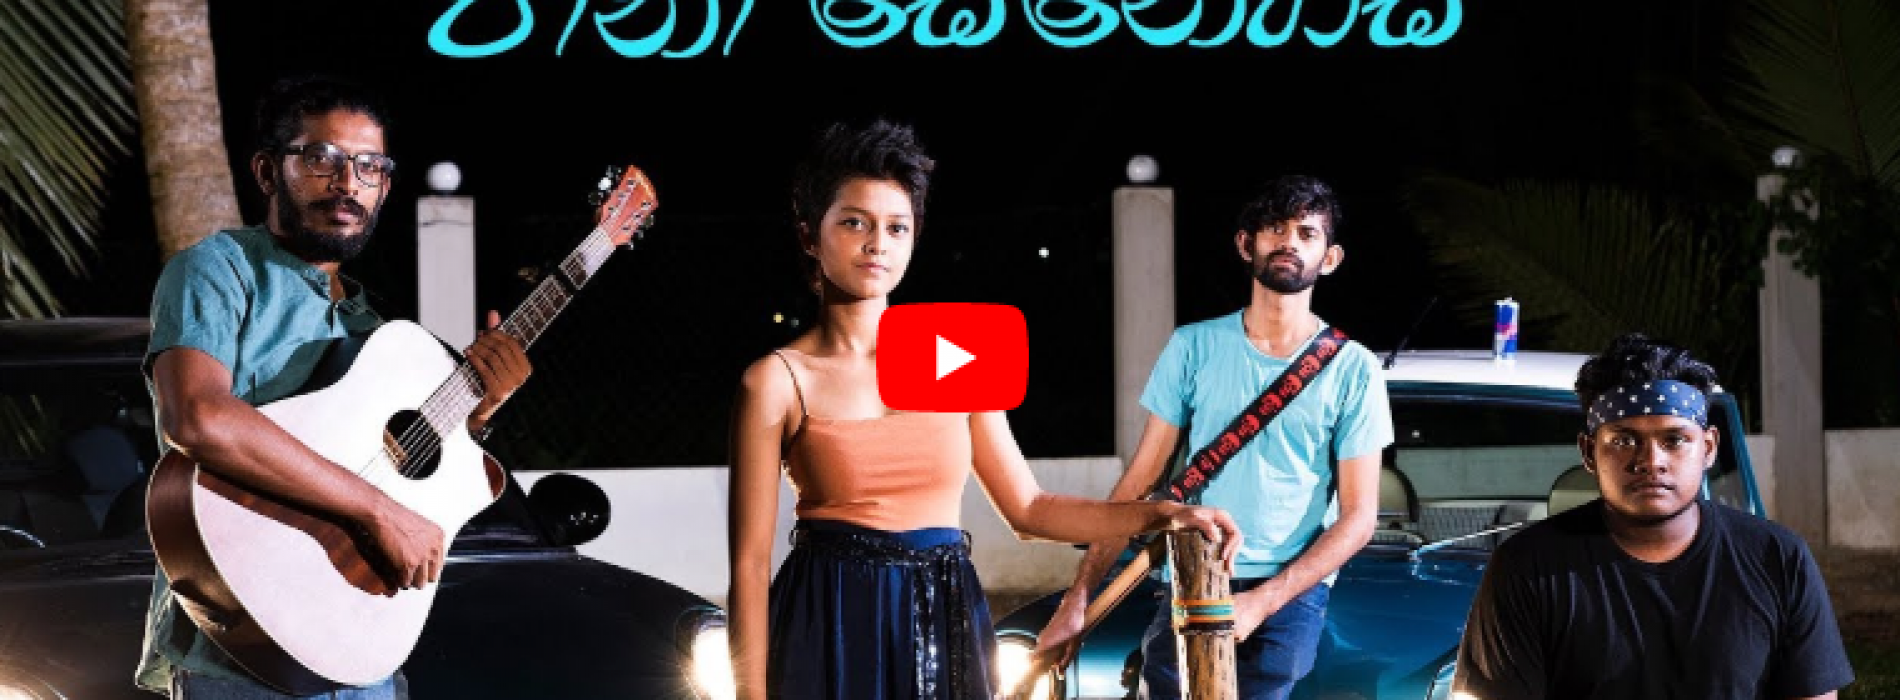 Dushyanth Weeraman – පානා සෙනෙහස / Pana Senehasa (Cover) Yohani ft Fifteenth March